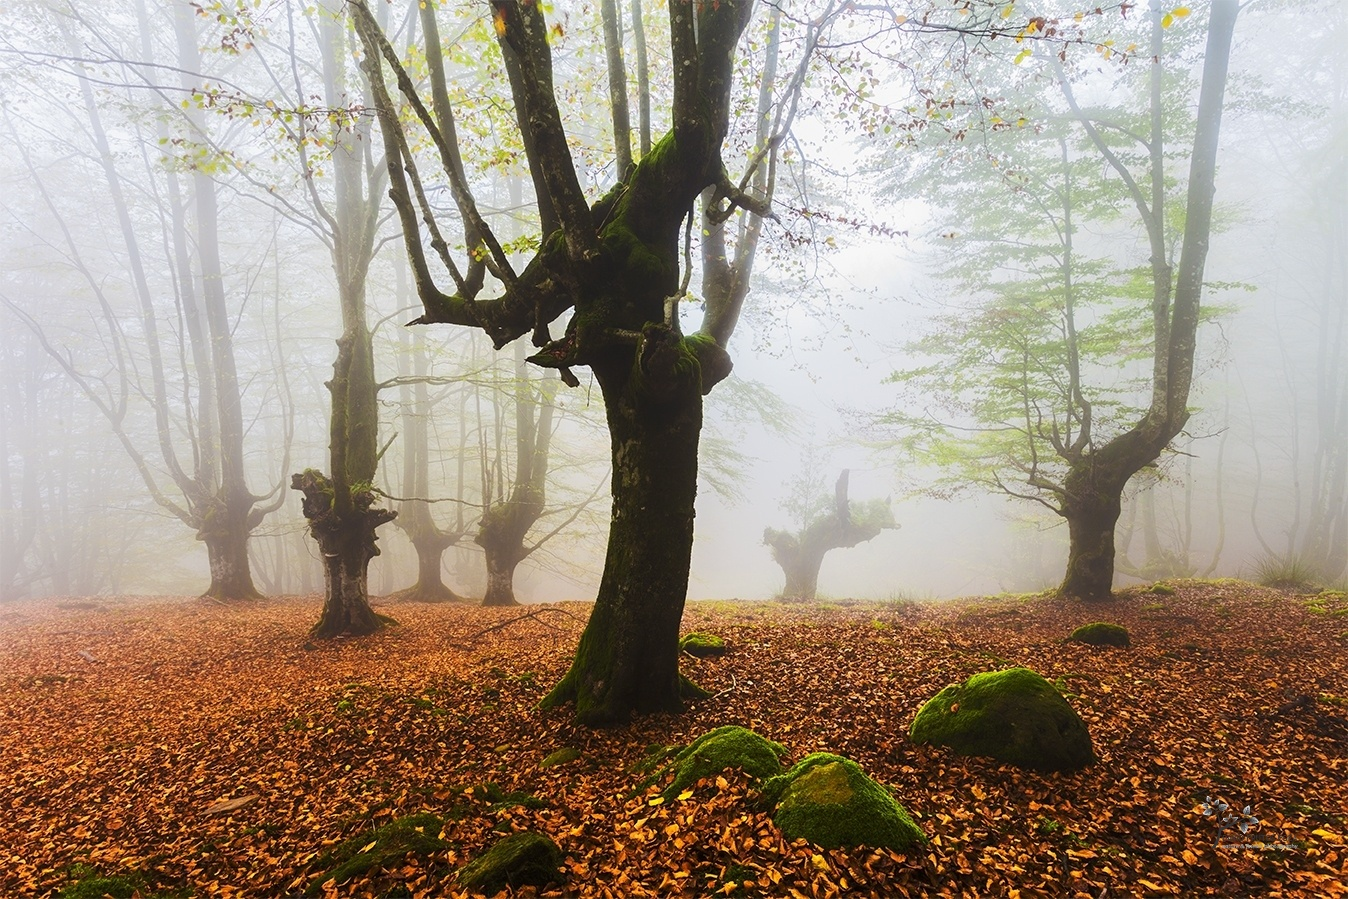 The Fairies´s World III - Mundo de Hadas - David Frutos Egea | Fotos del hayedo más bello de España.